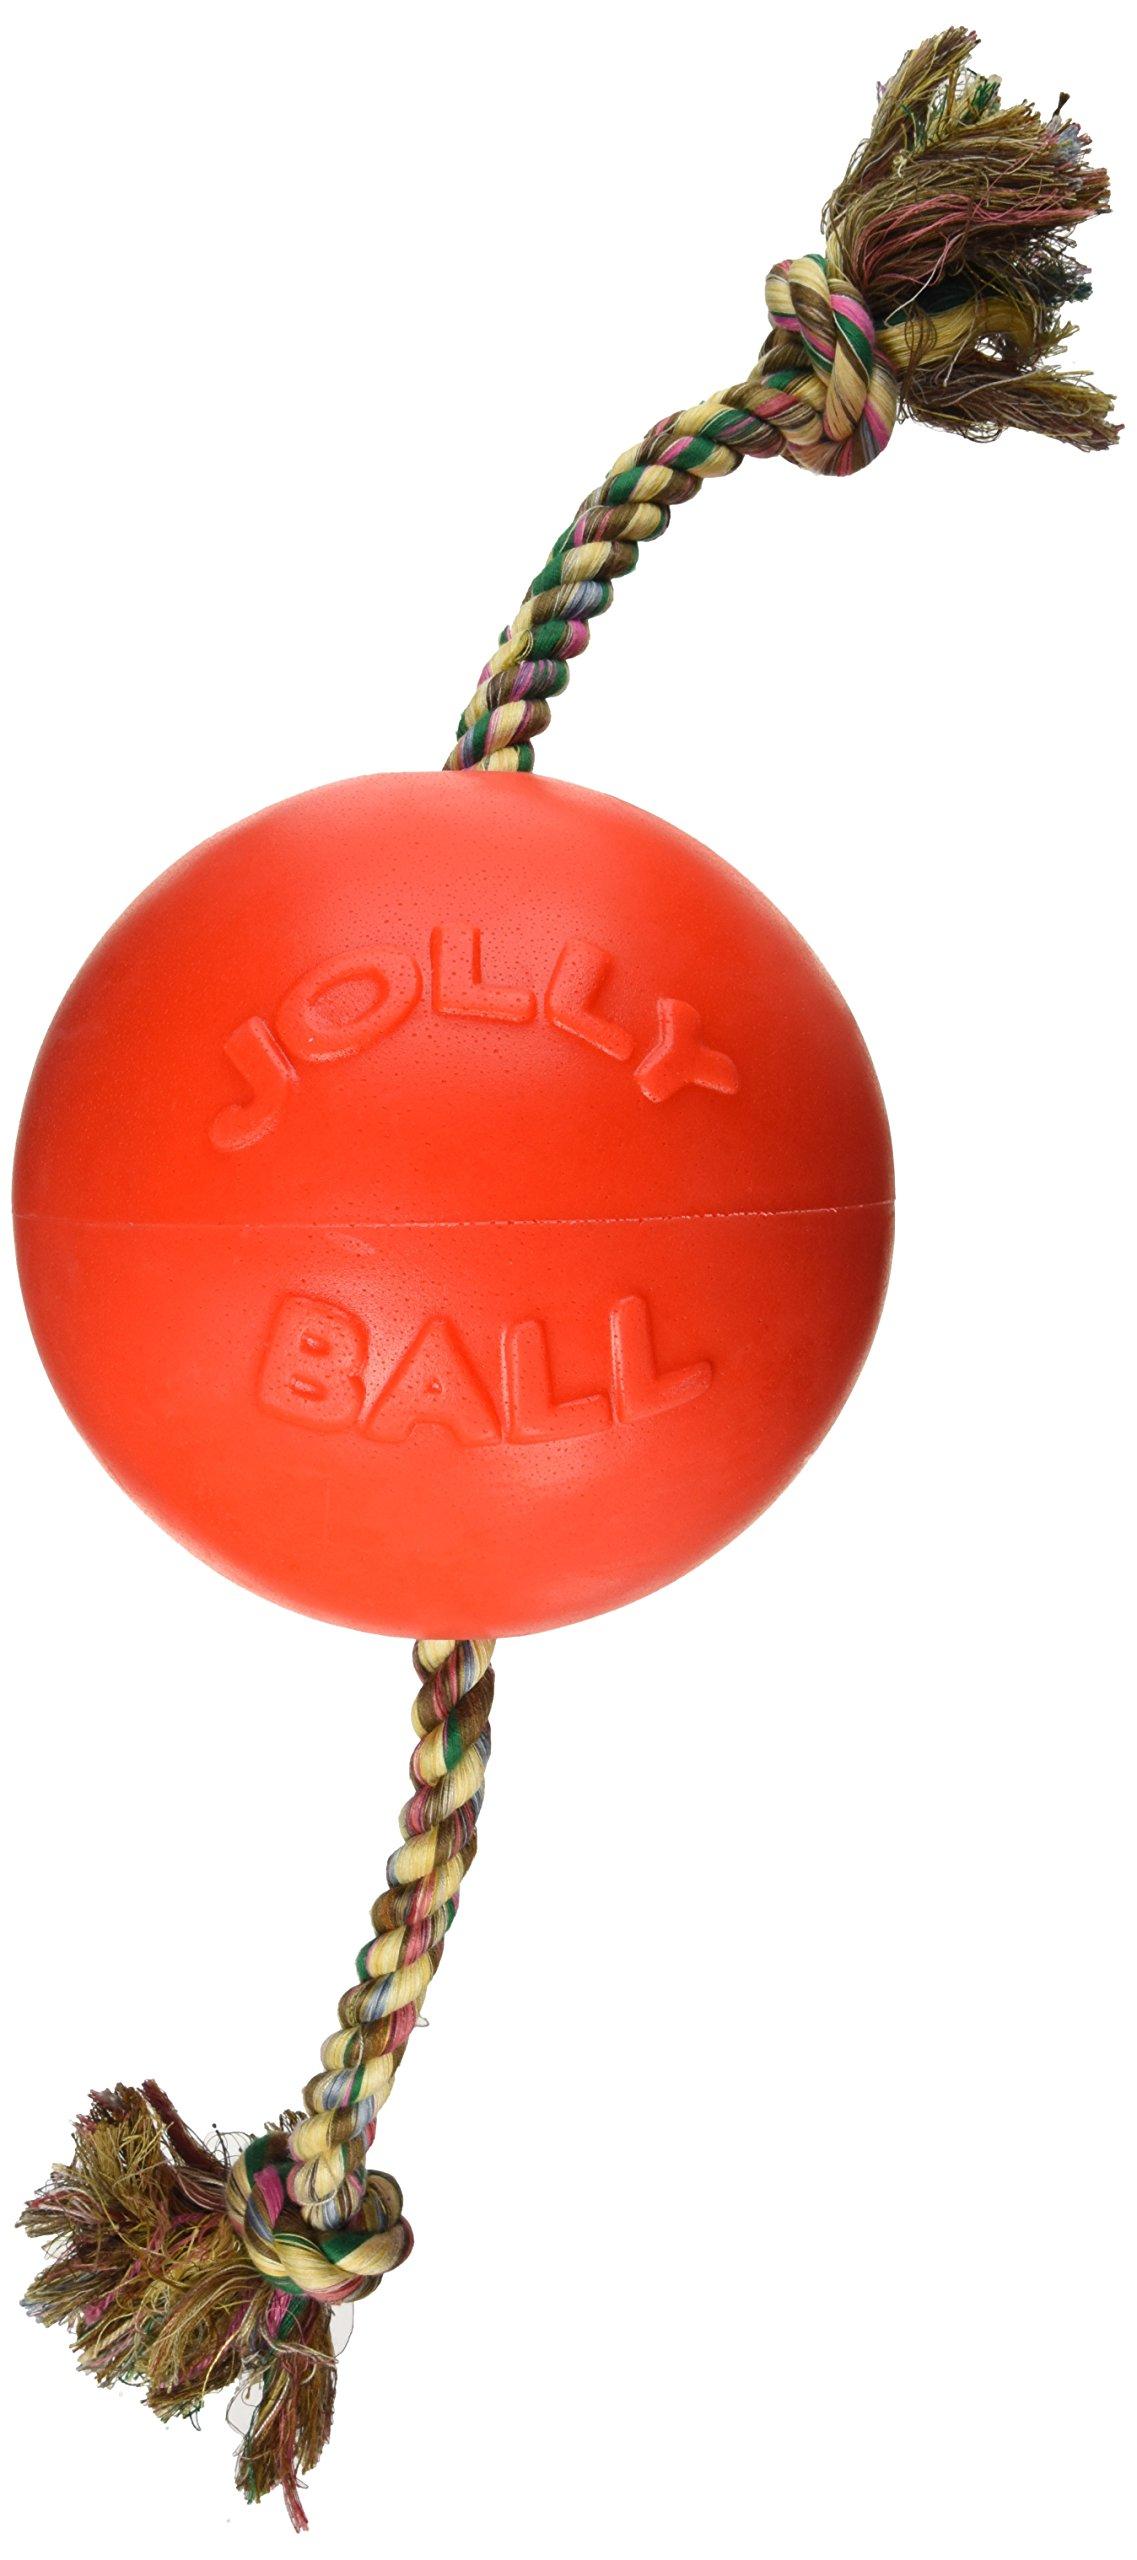 Jolly Pets 8'' Romp-n-Roll Dog Toy, Large, Orange